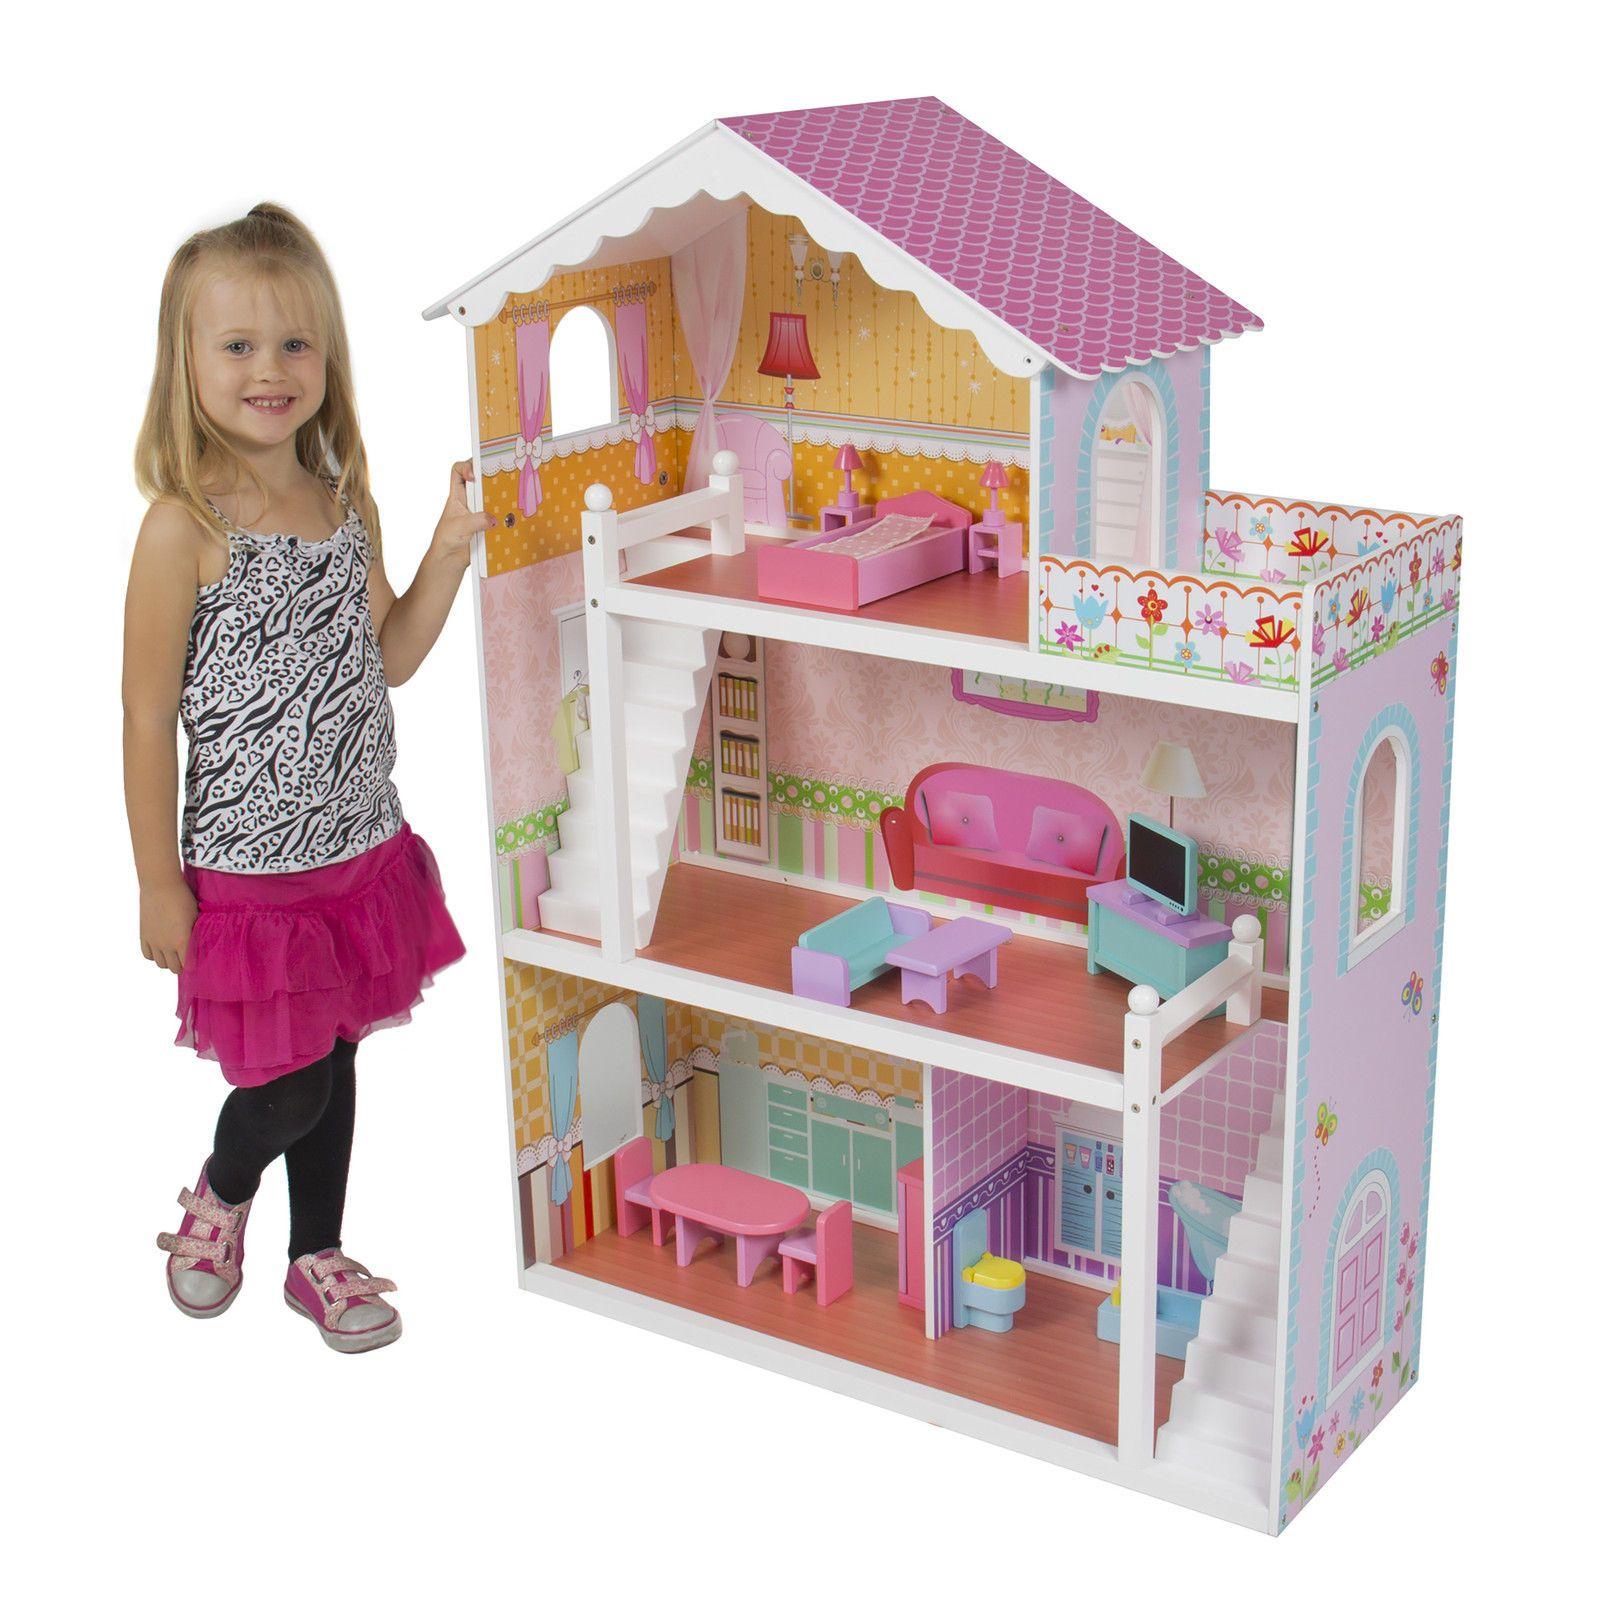 barbie dollhouse furniture cheap. large children\u0027s wooden dollhouse w/ furniture for $80 http://sylsdeals.com barbie cheap s